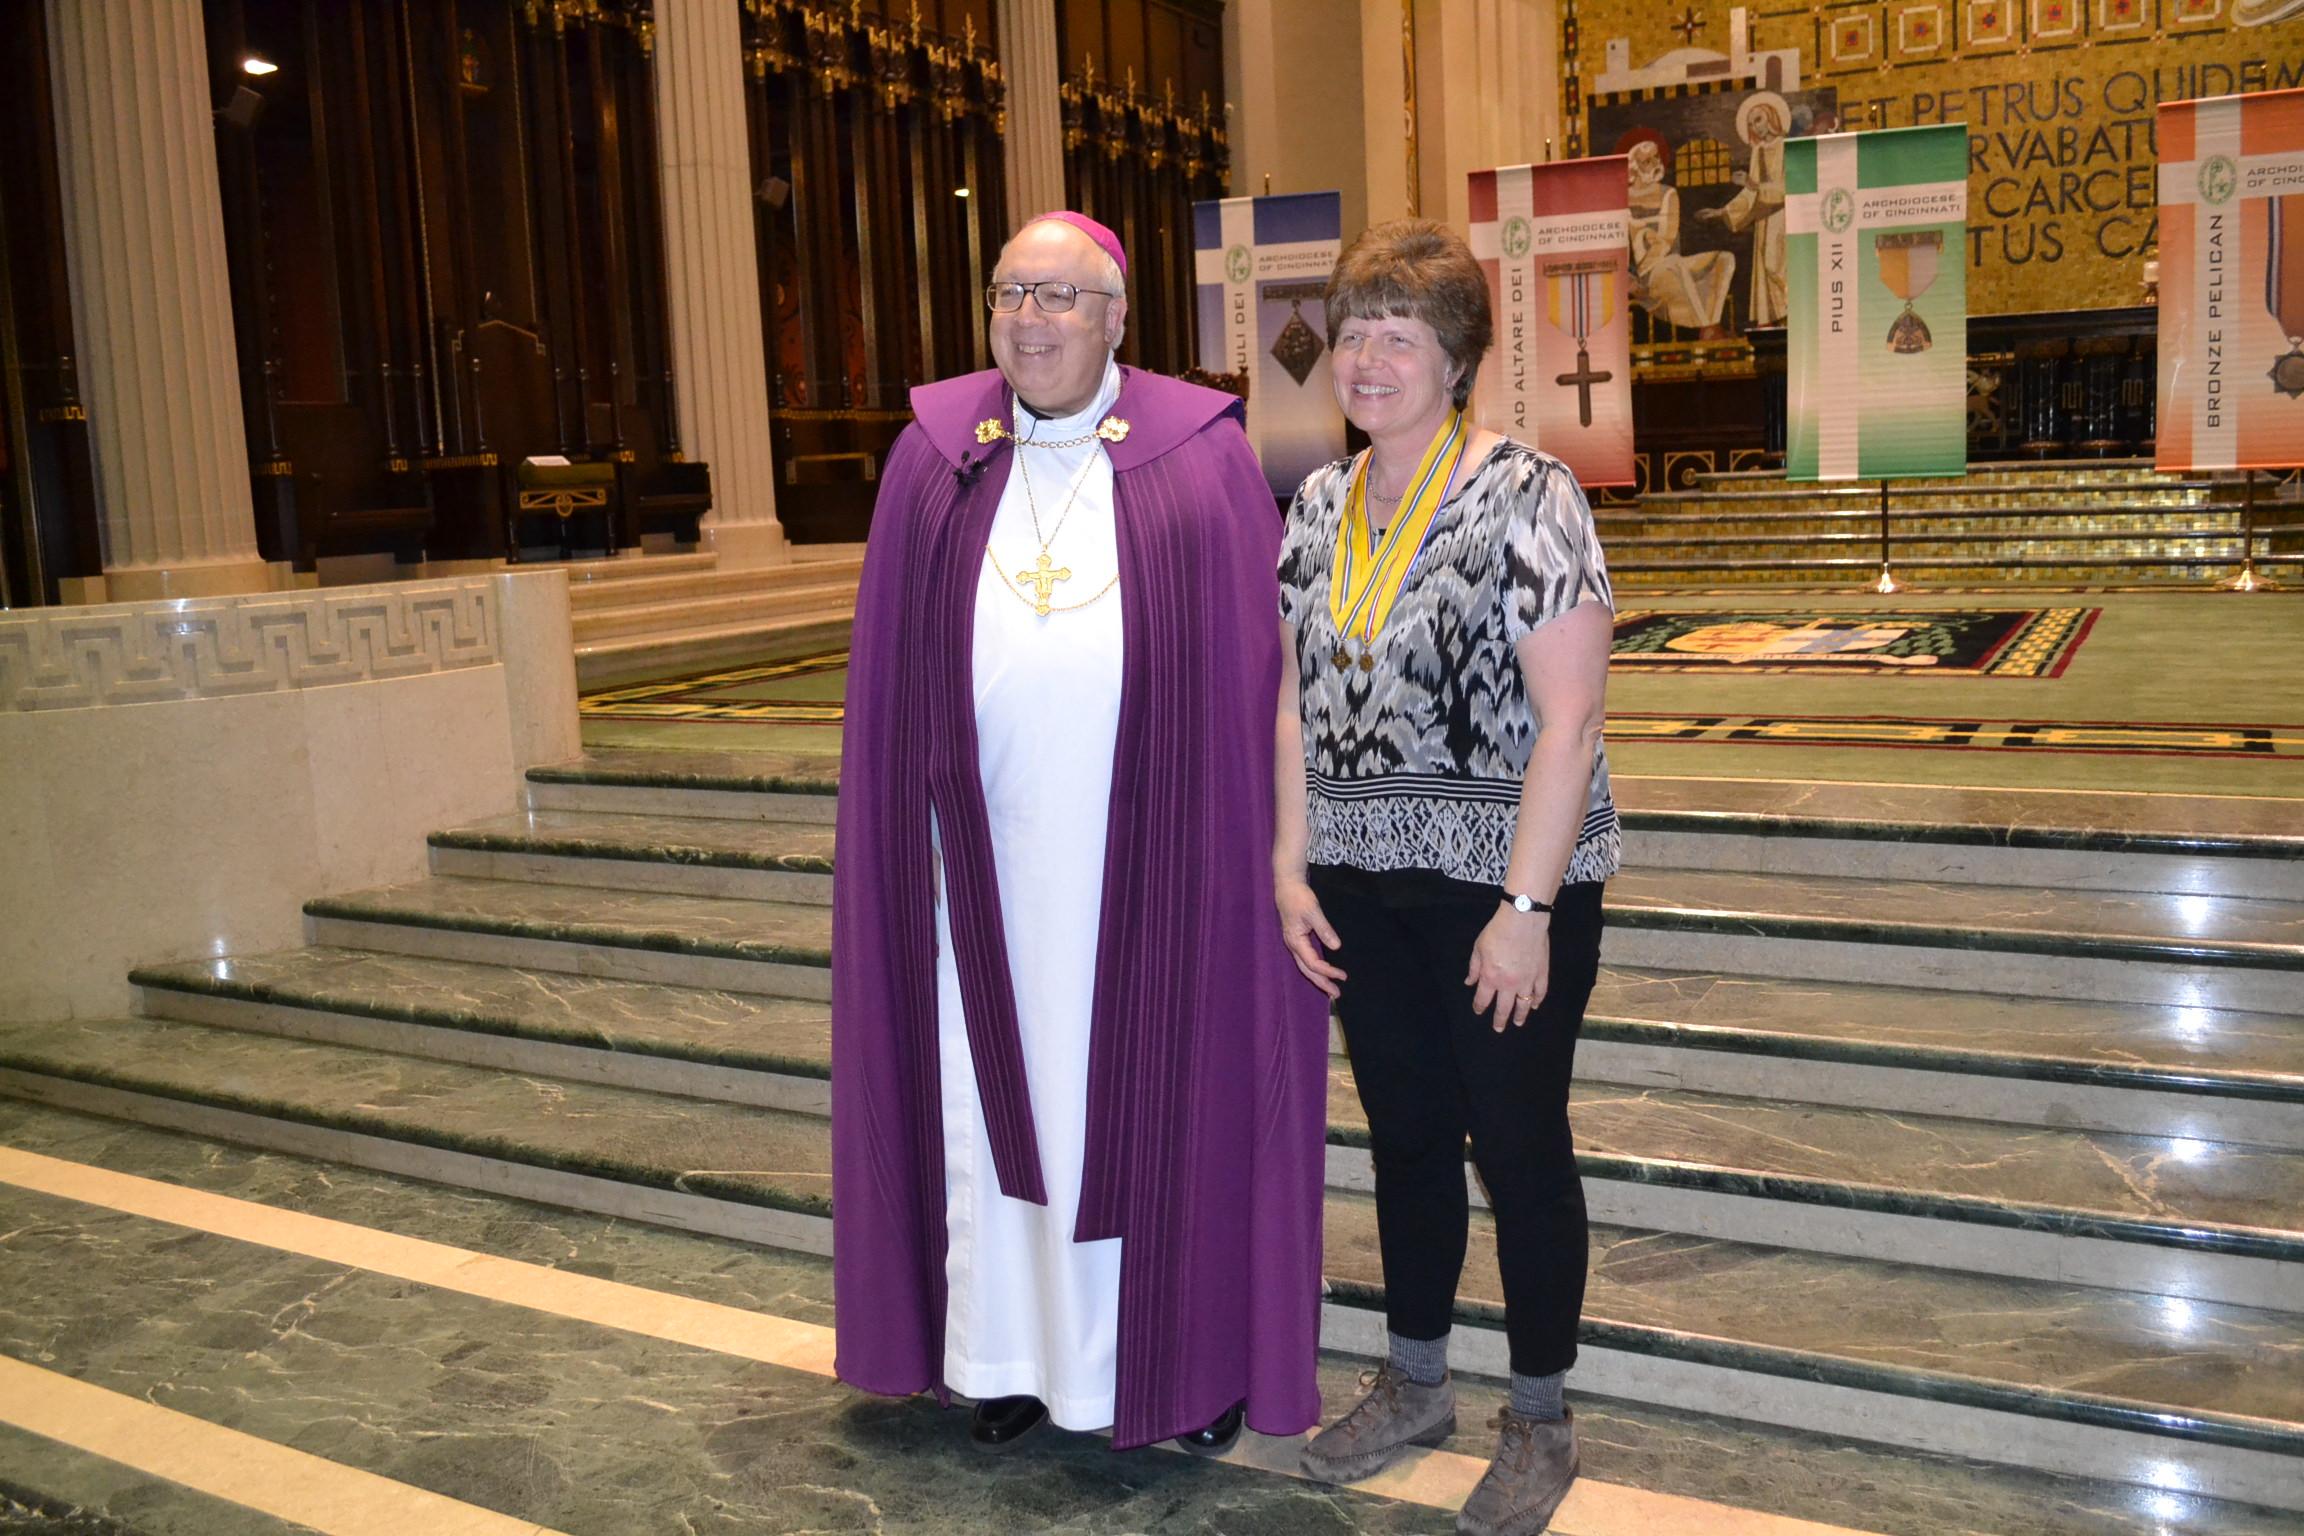 Mary Ellen Moeller recieves the St. George Award (CT Photo/Greg Hartman)